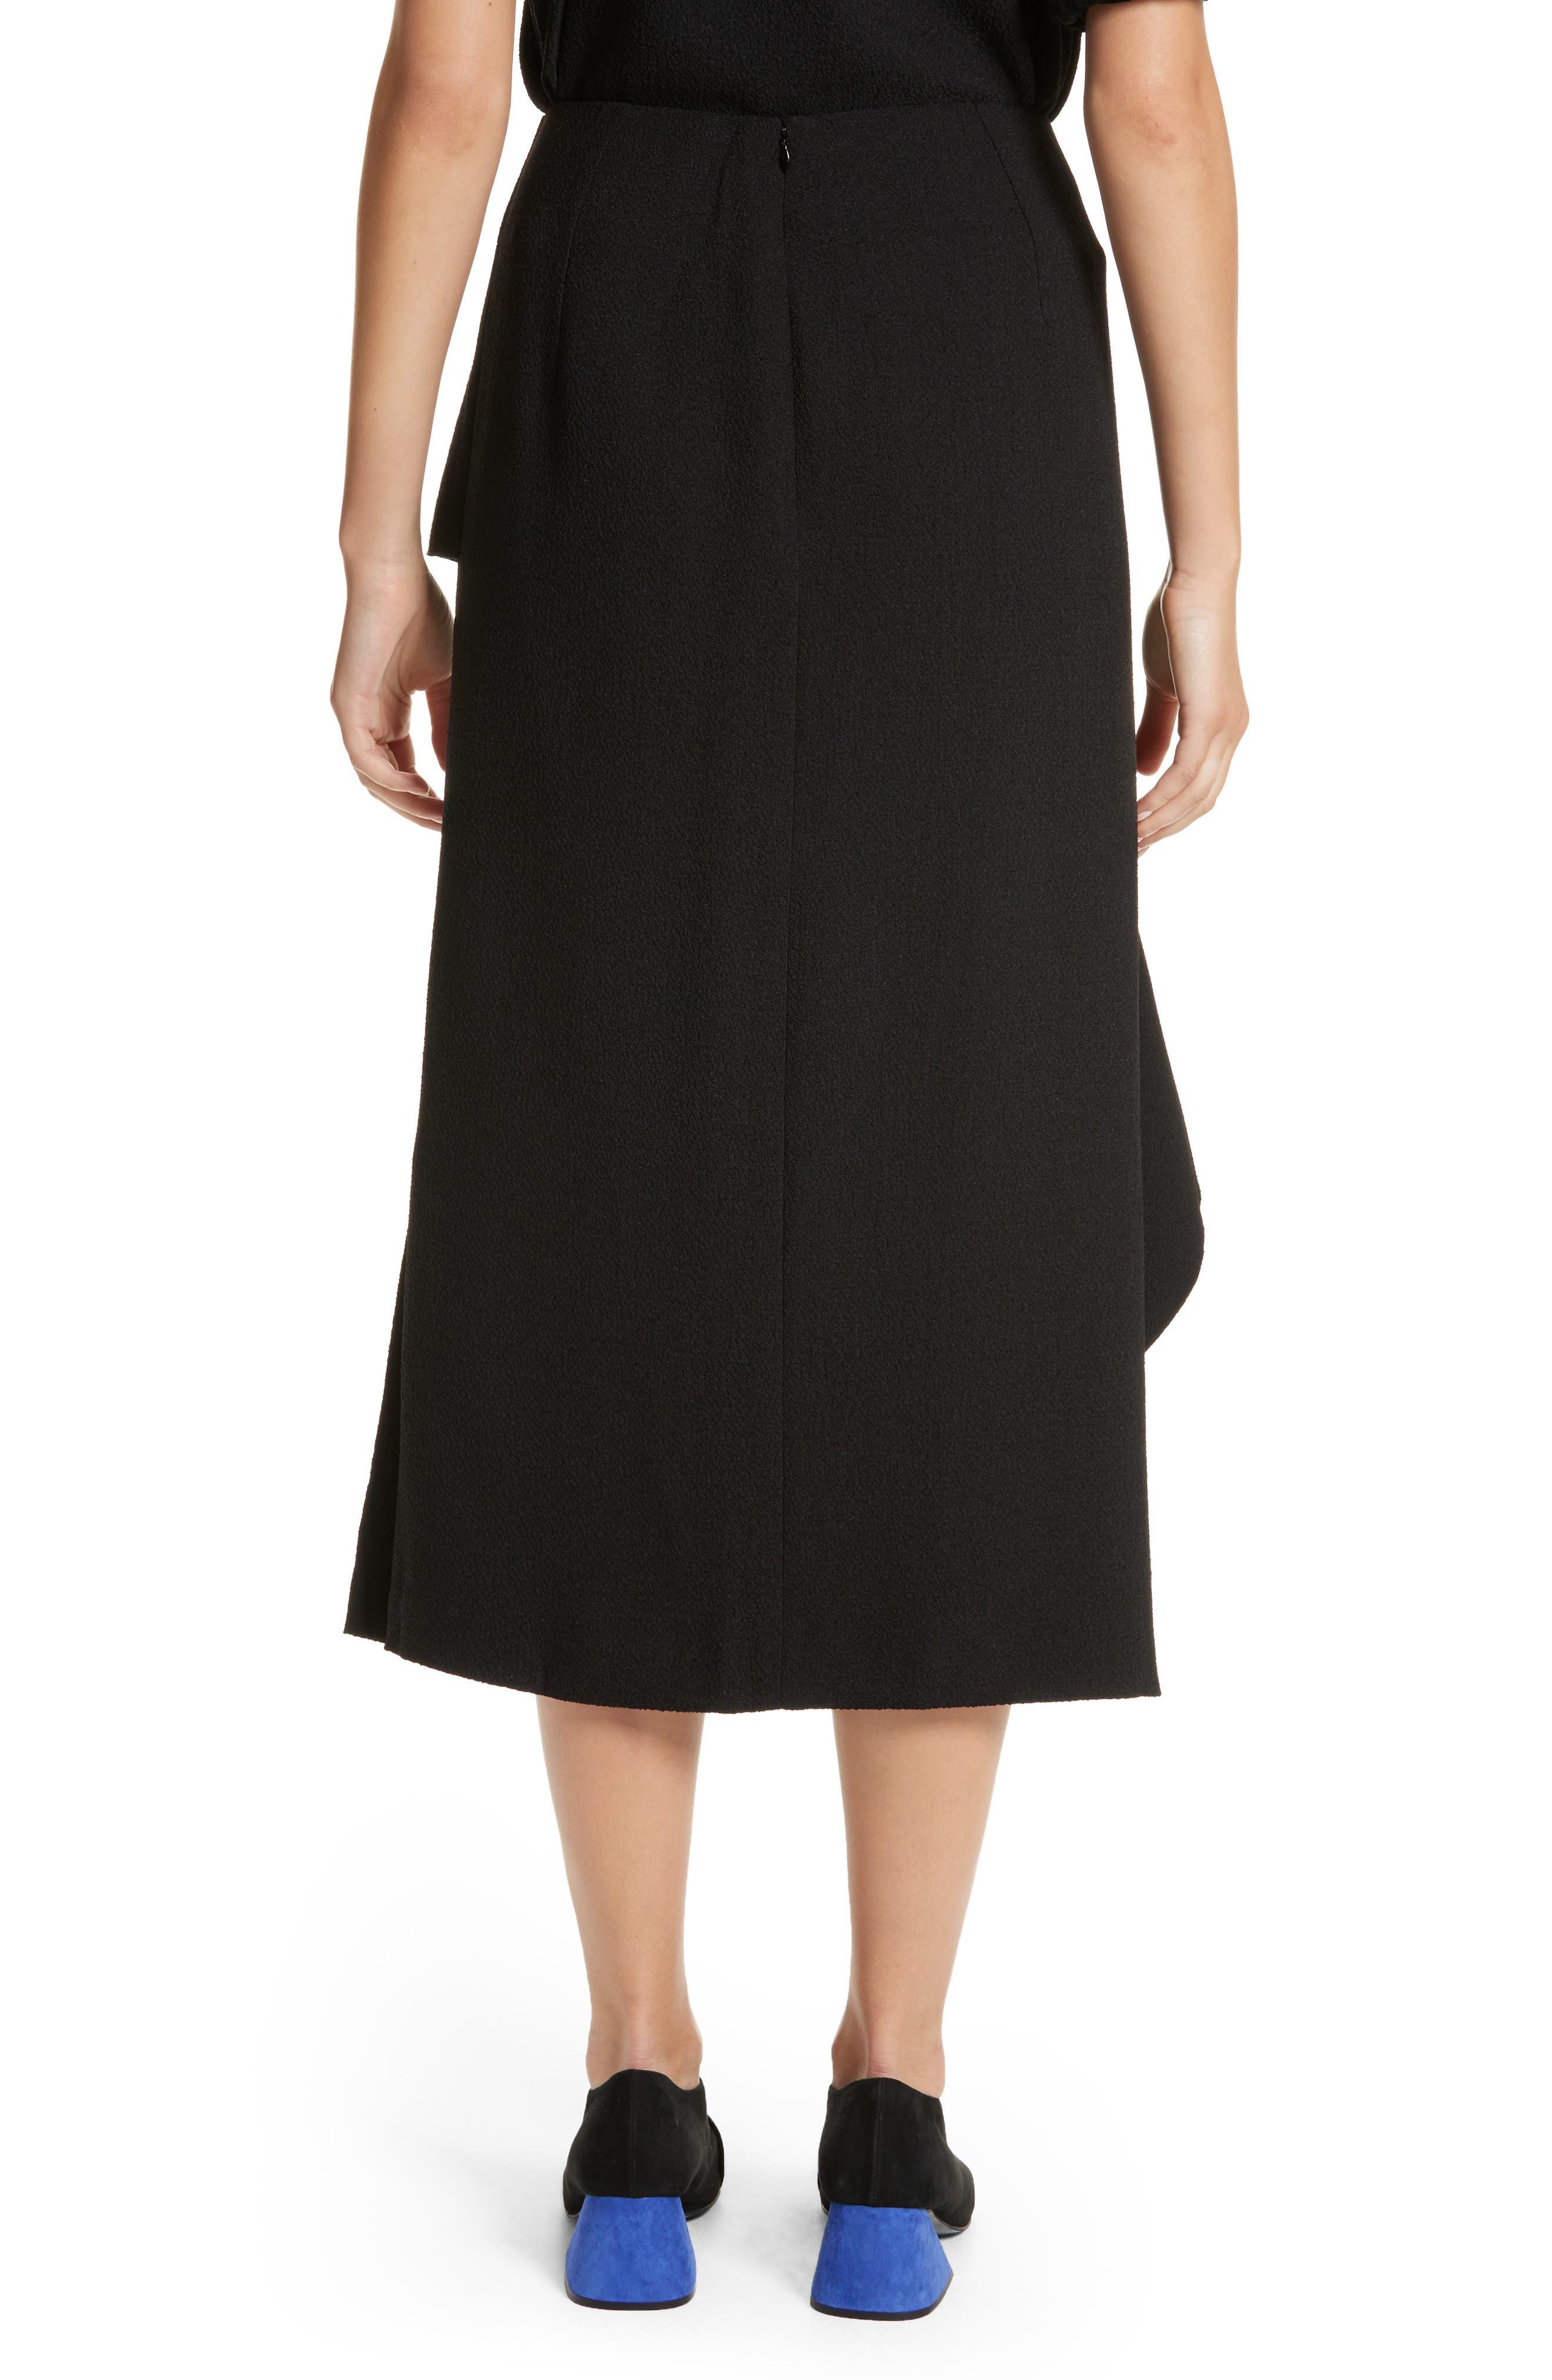 Alternate Image 2  - Rejina Pyo Maude Ruffle Panel Crepe Skirt (Nordstrom Exclusive)